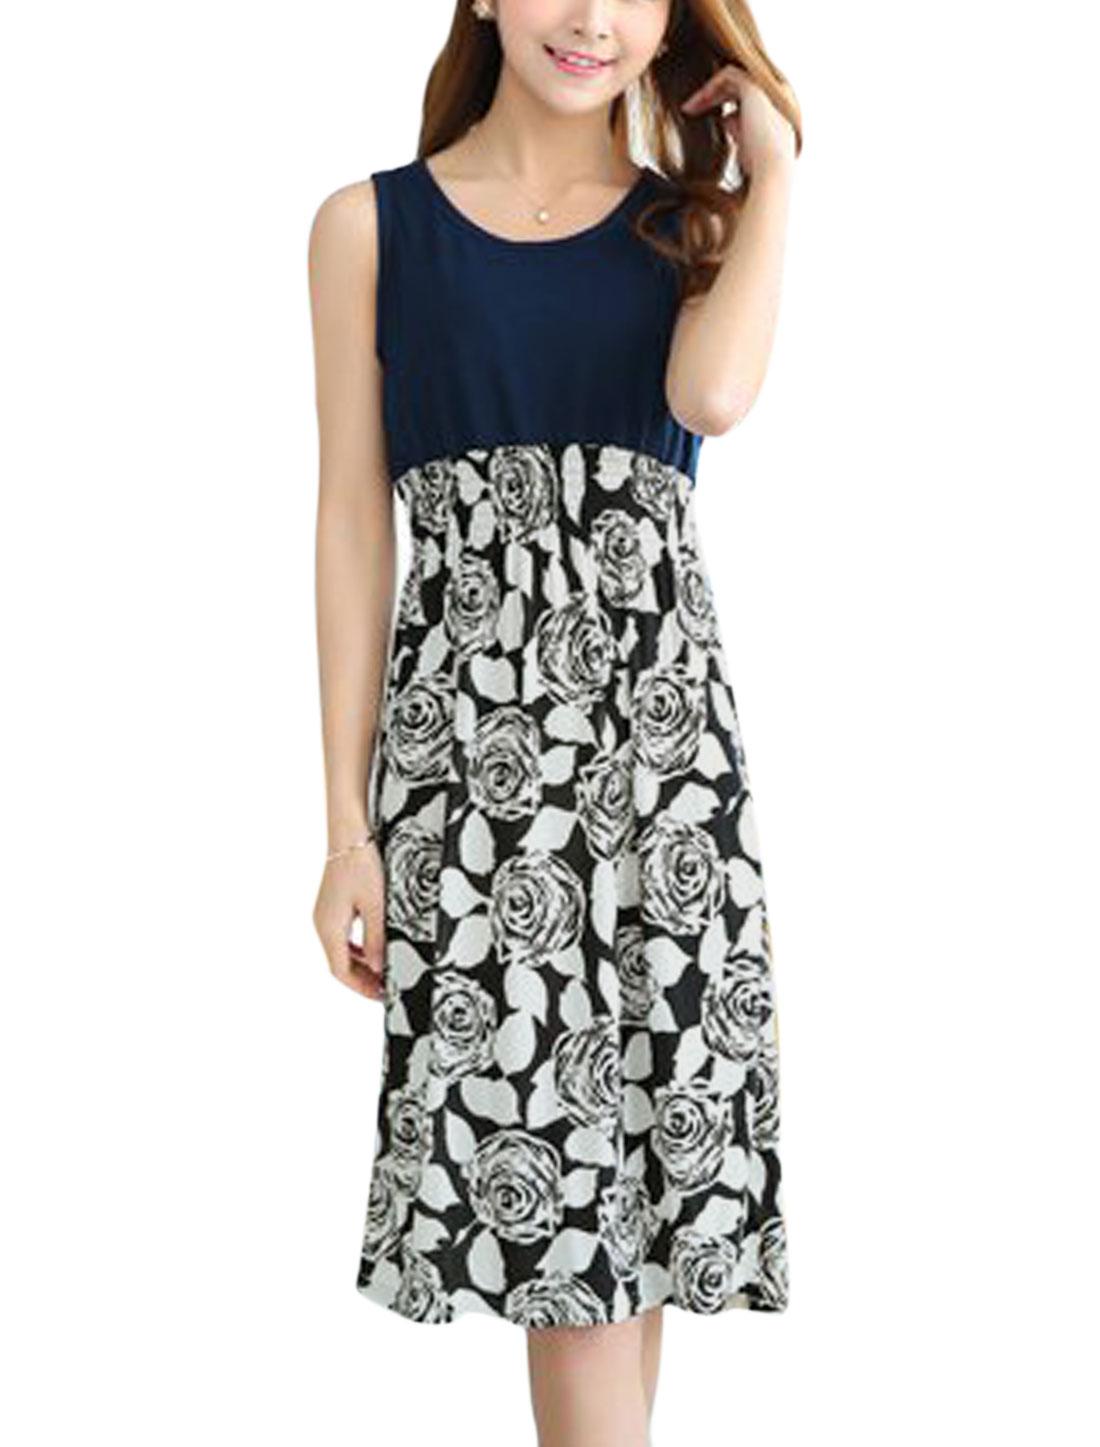 Woman Roses Pattern Round Neck Sleeveless A Line Dress Navy Blue White XS